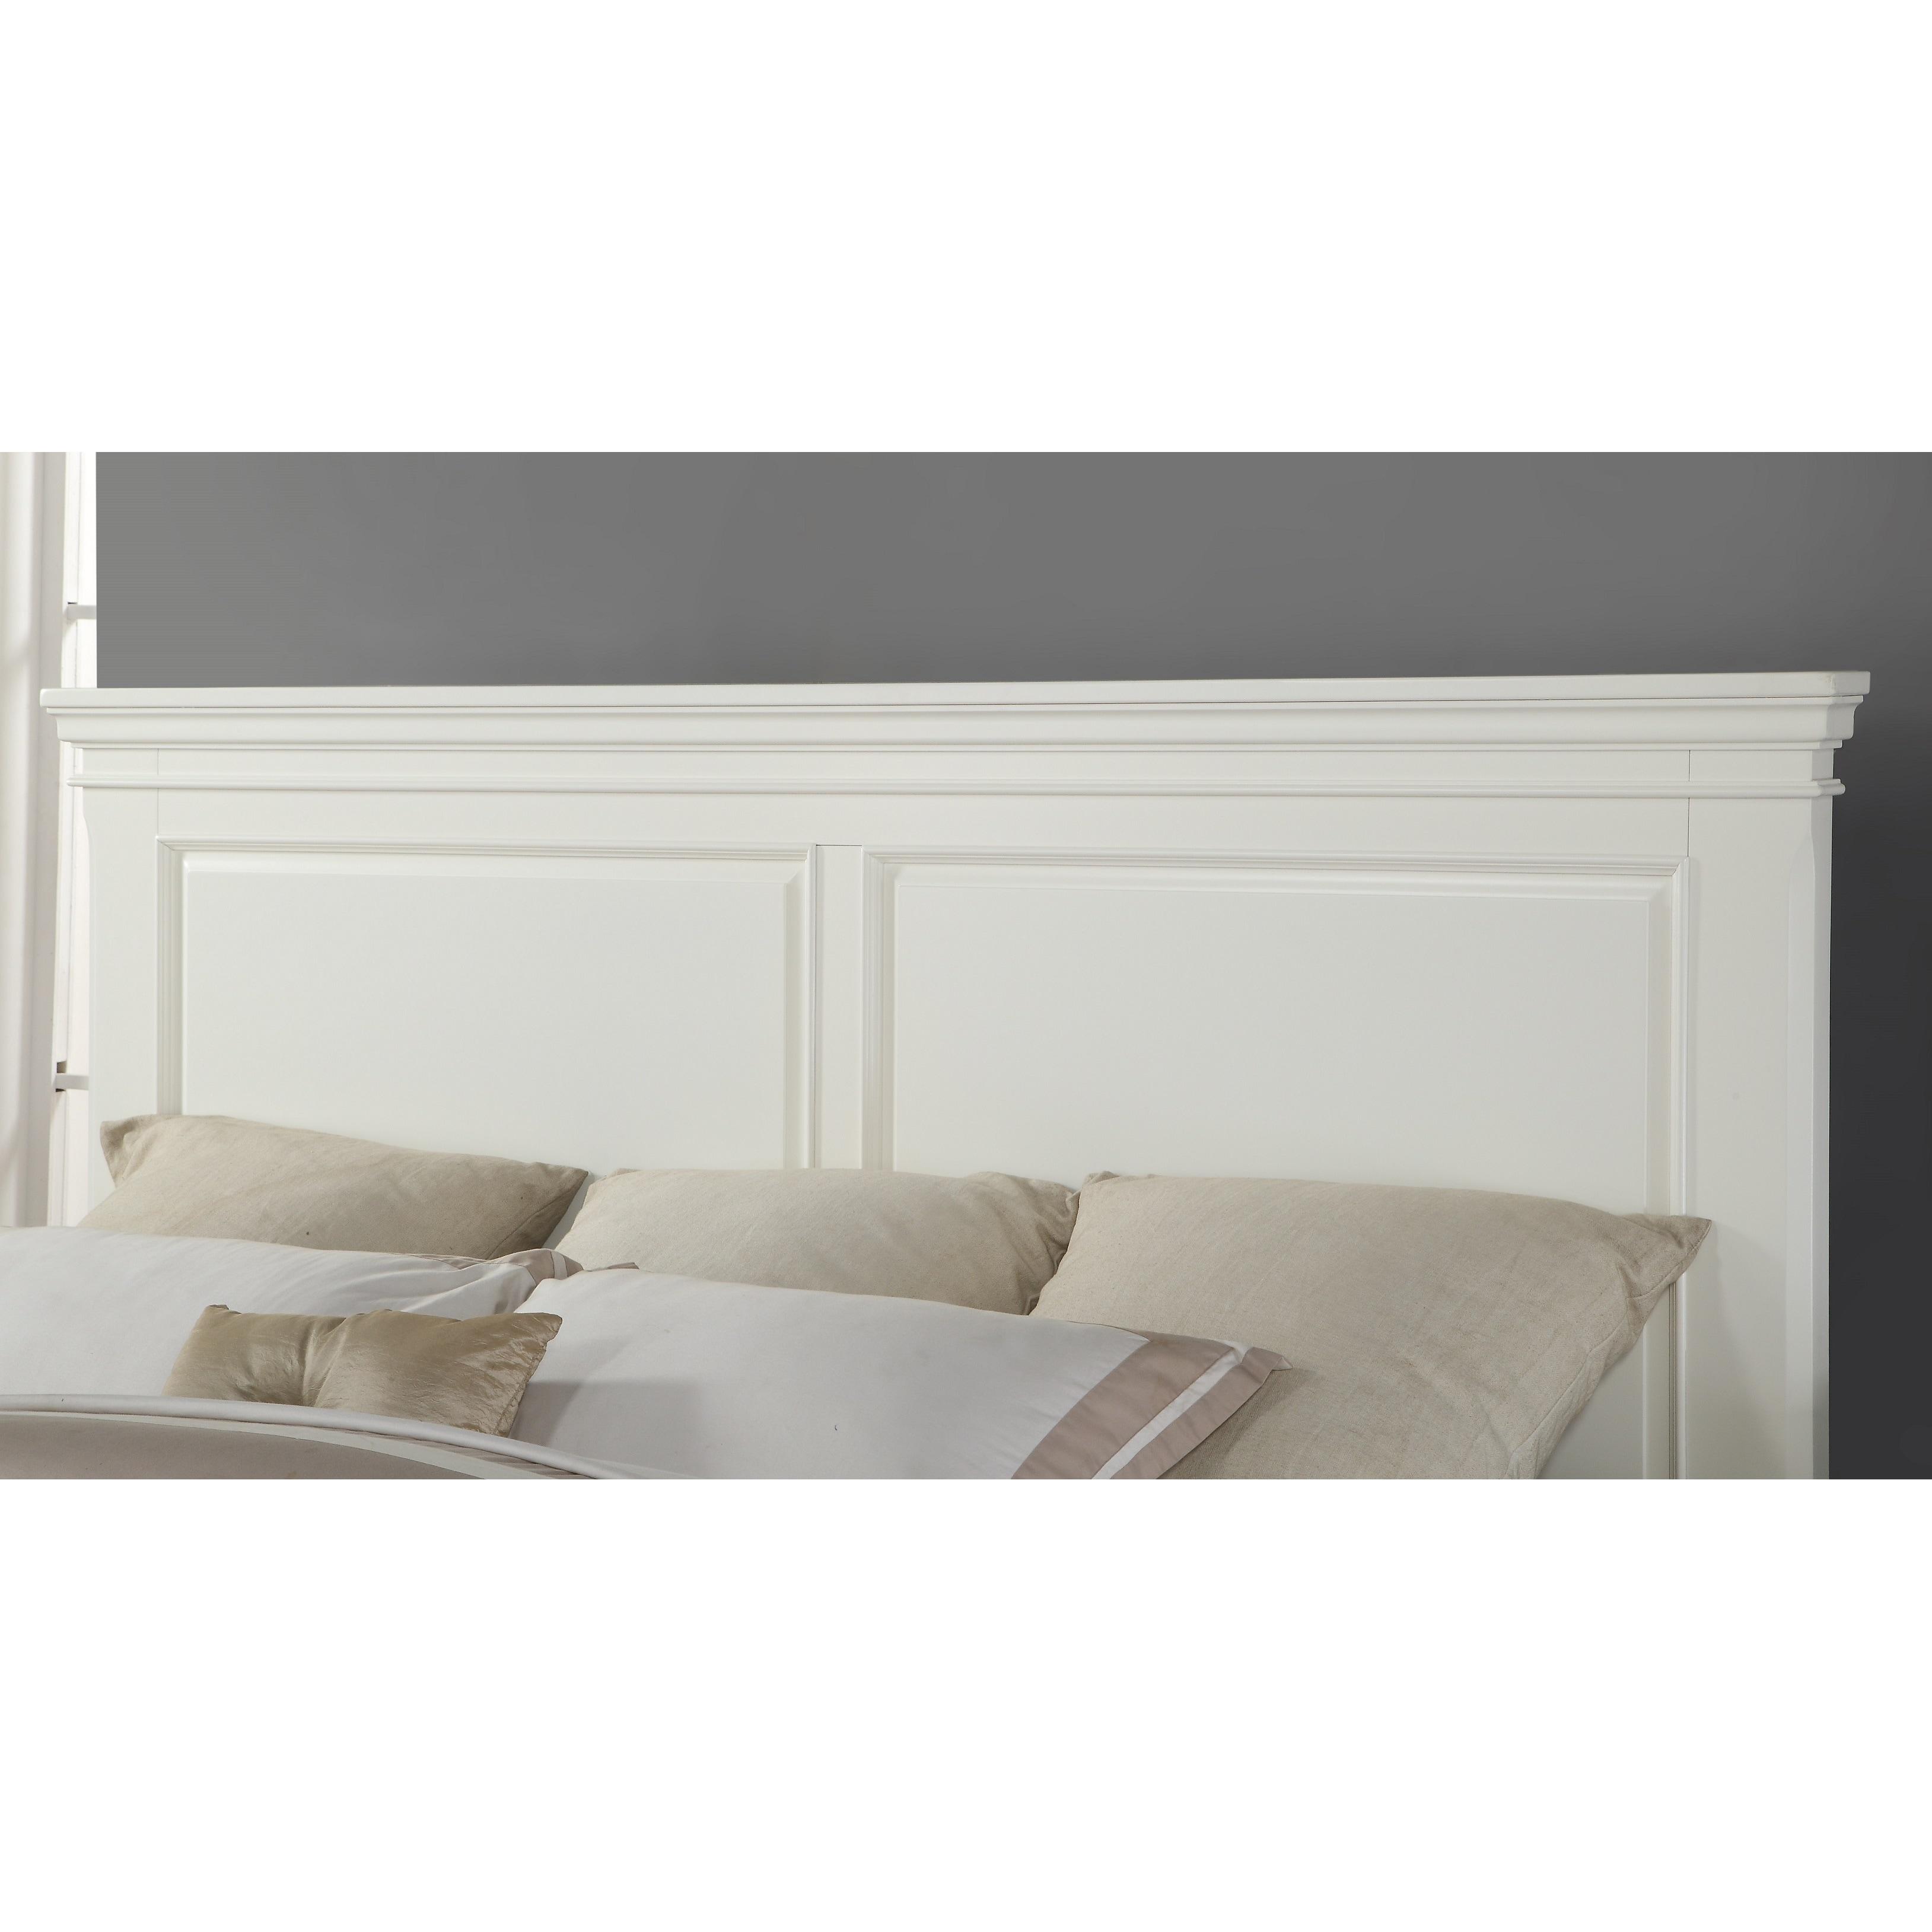 Laveno 012 White Wood Bedroom Furniture Set